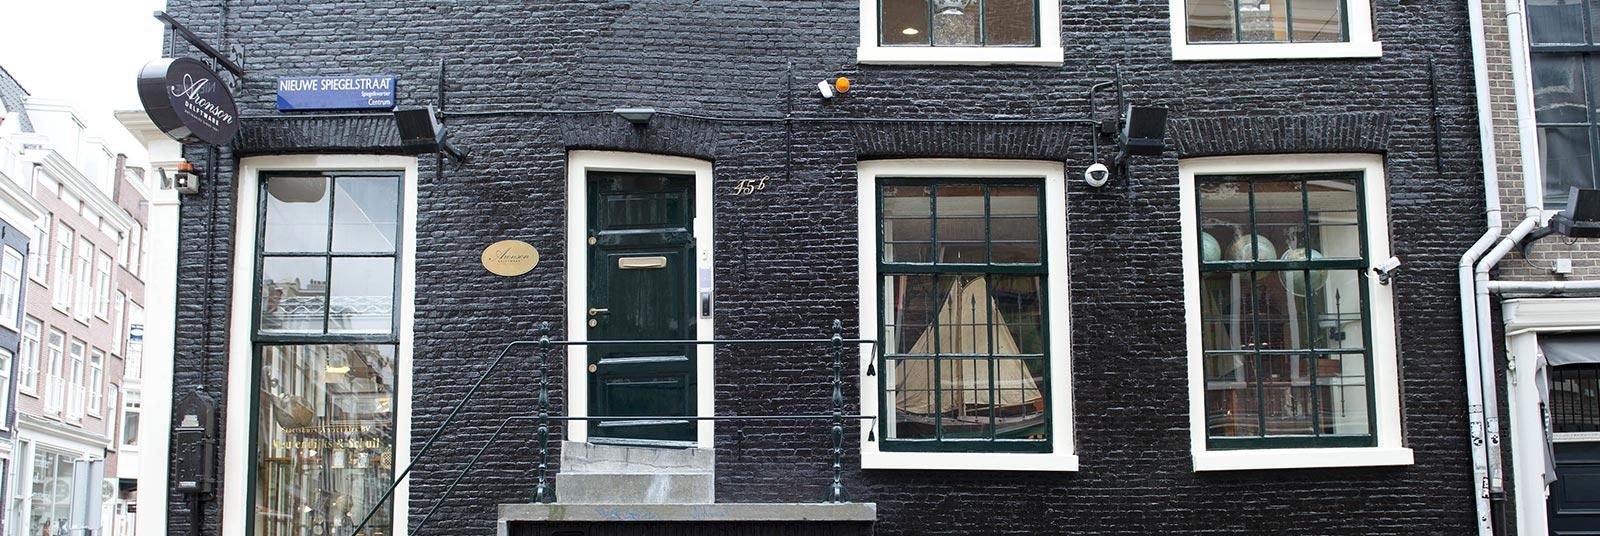 Monumentaal Schilderwerk - Header Kerkstraat